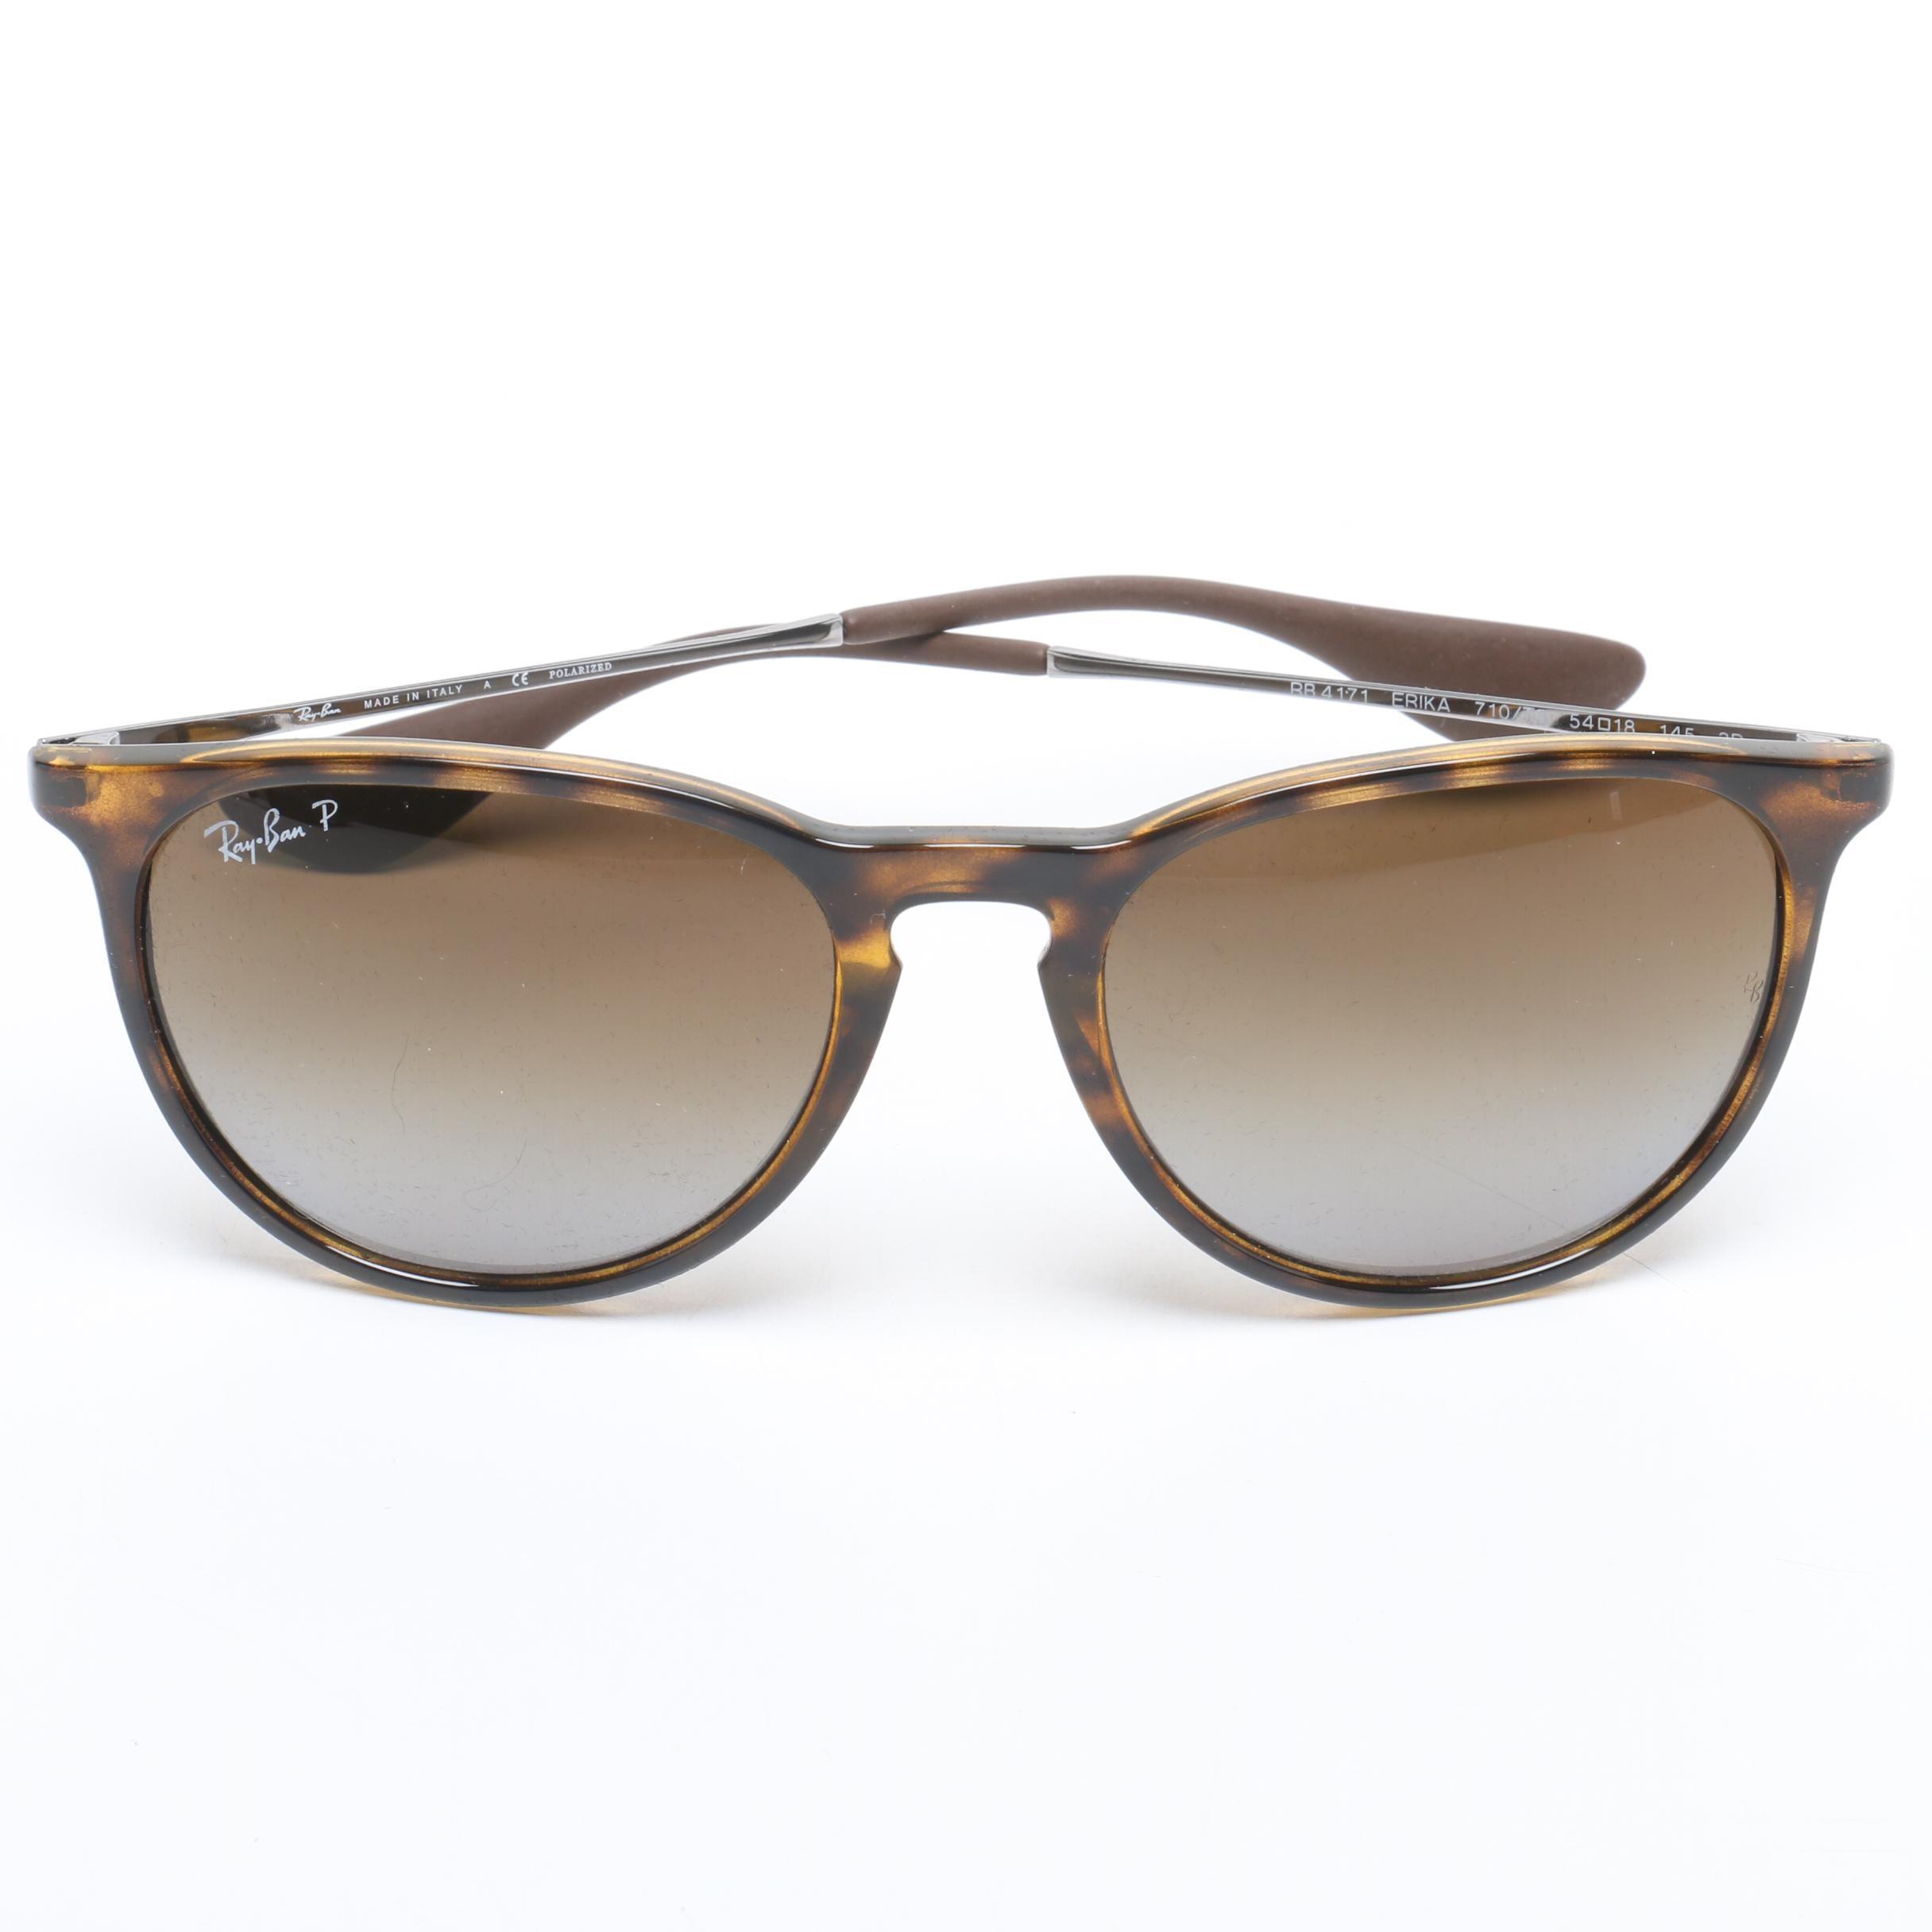 Ray-Ban Tortoiseshell Style Erika Polarized Sunglasses, Made in Italy